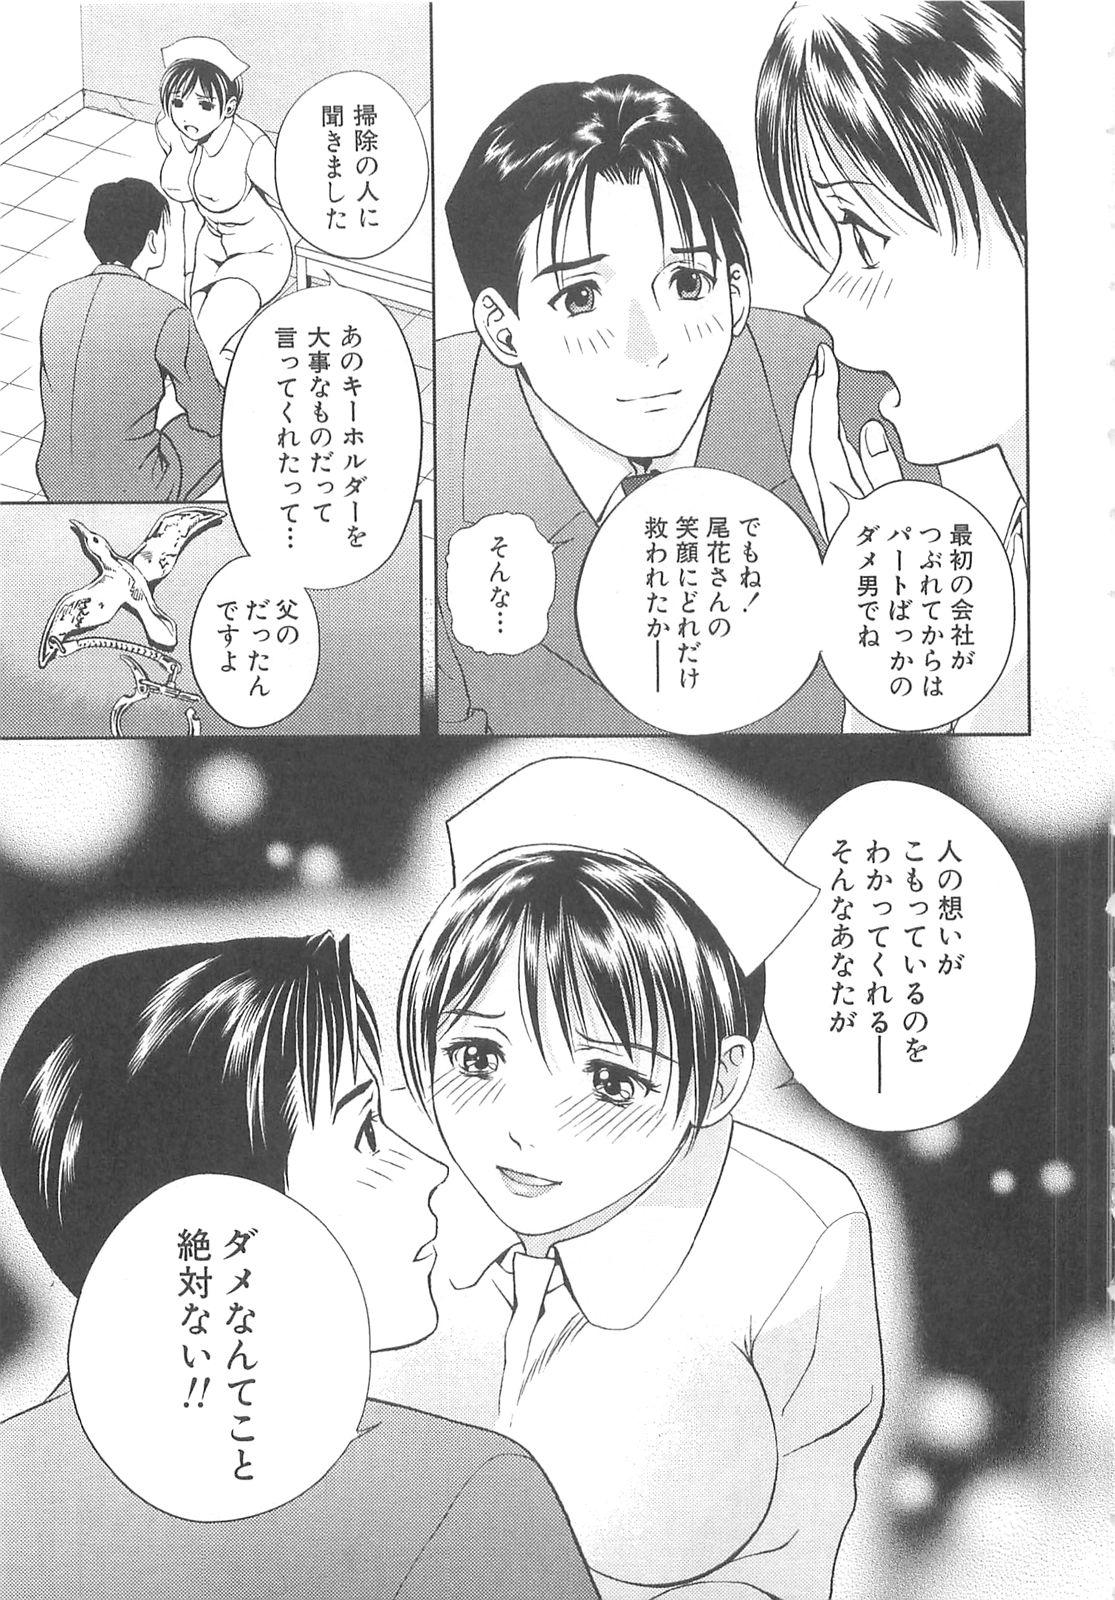 Tenshi no Kyuu - Angel's Pretty Hip 95